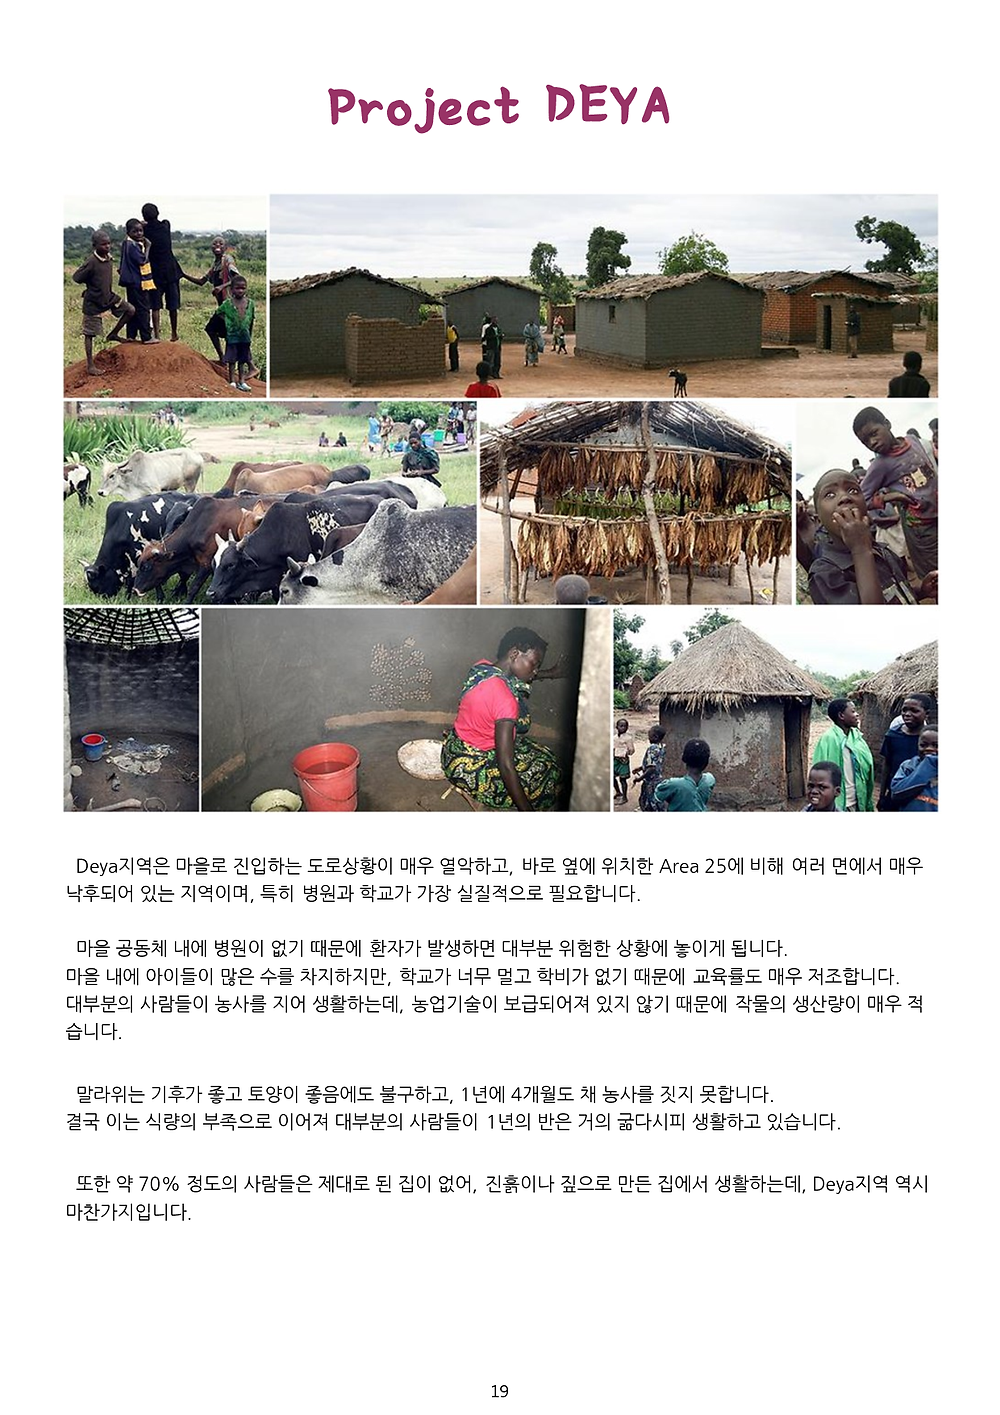 NWM 2014년 선교보고_19.png